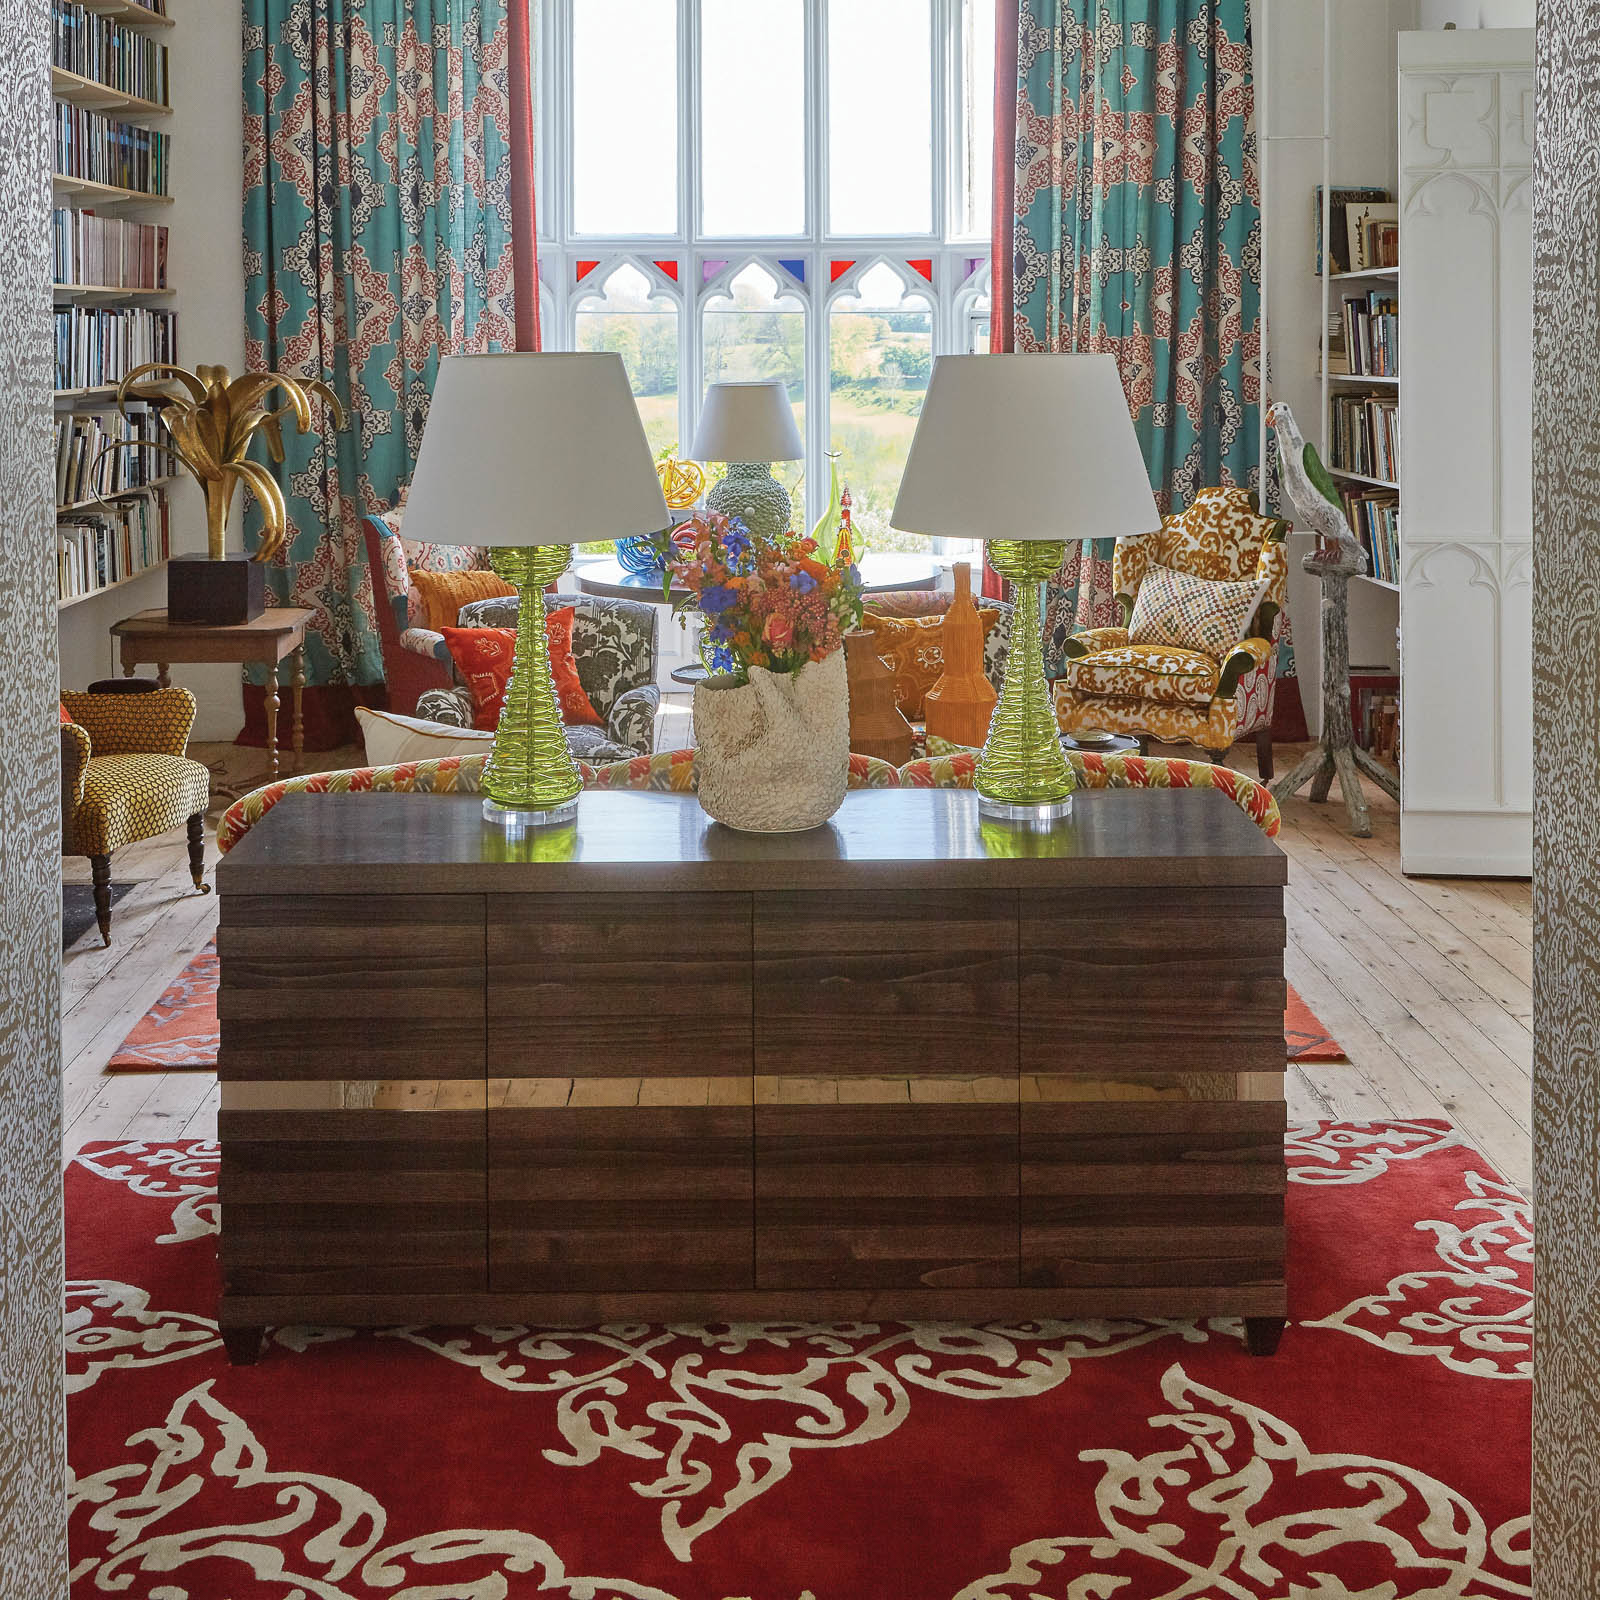 Carlotta rugs in Brick by William Yeoward